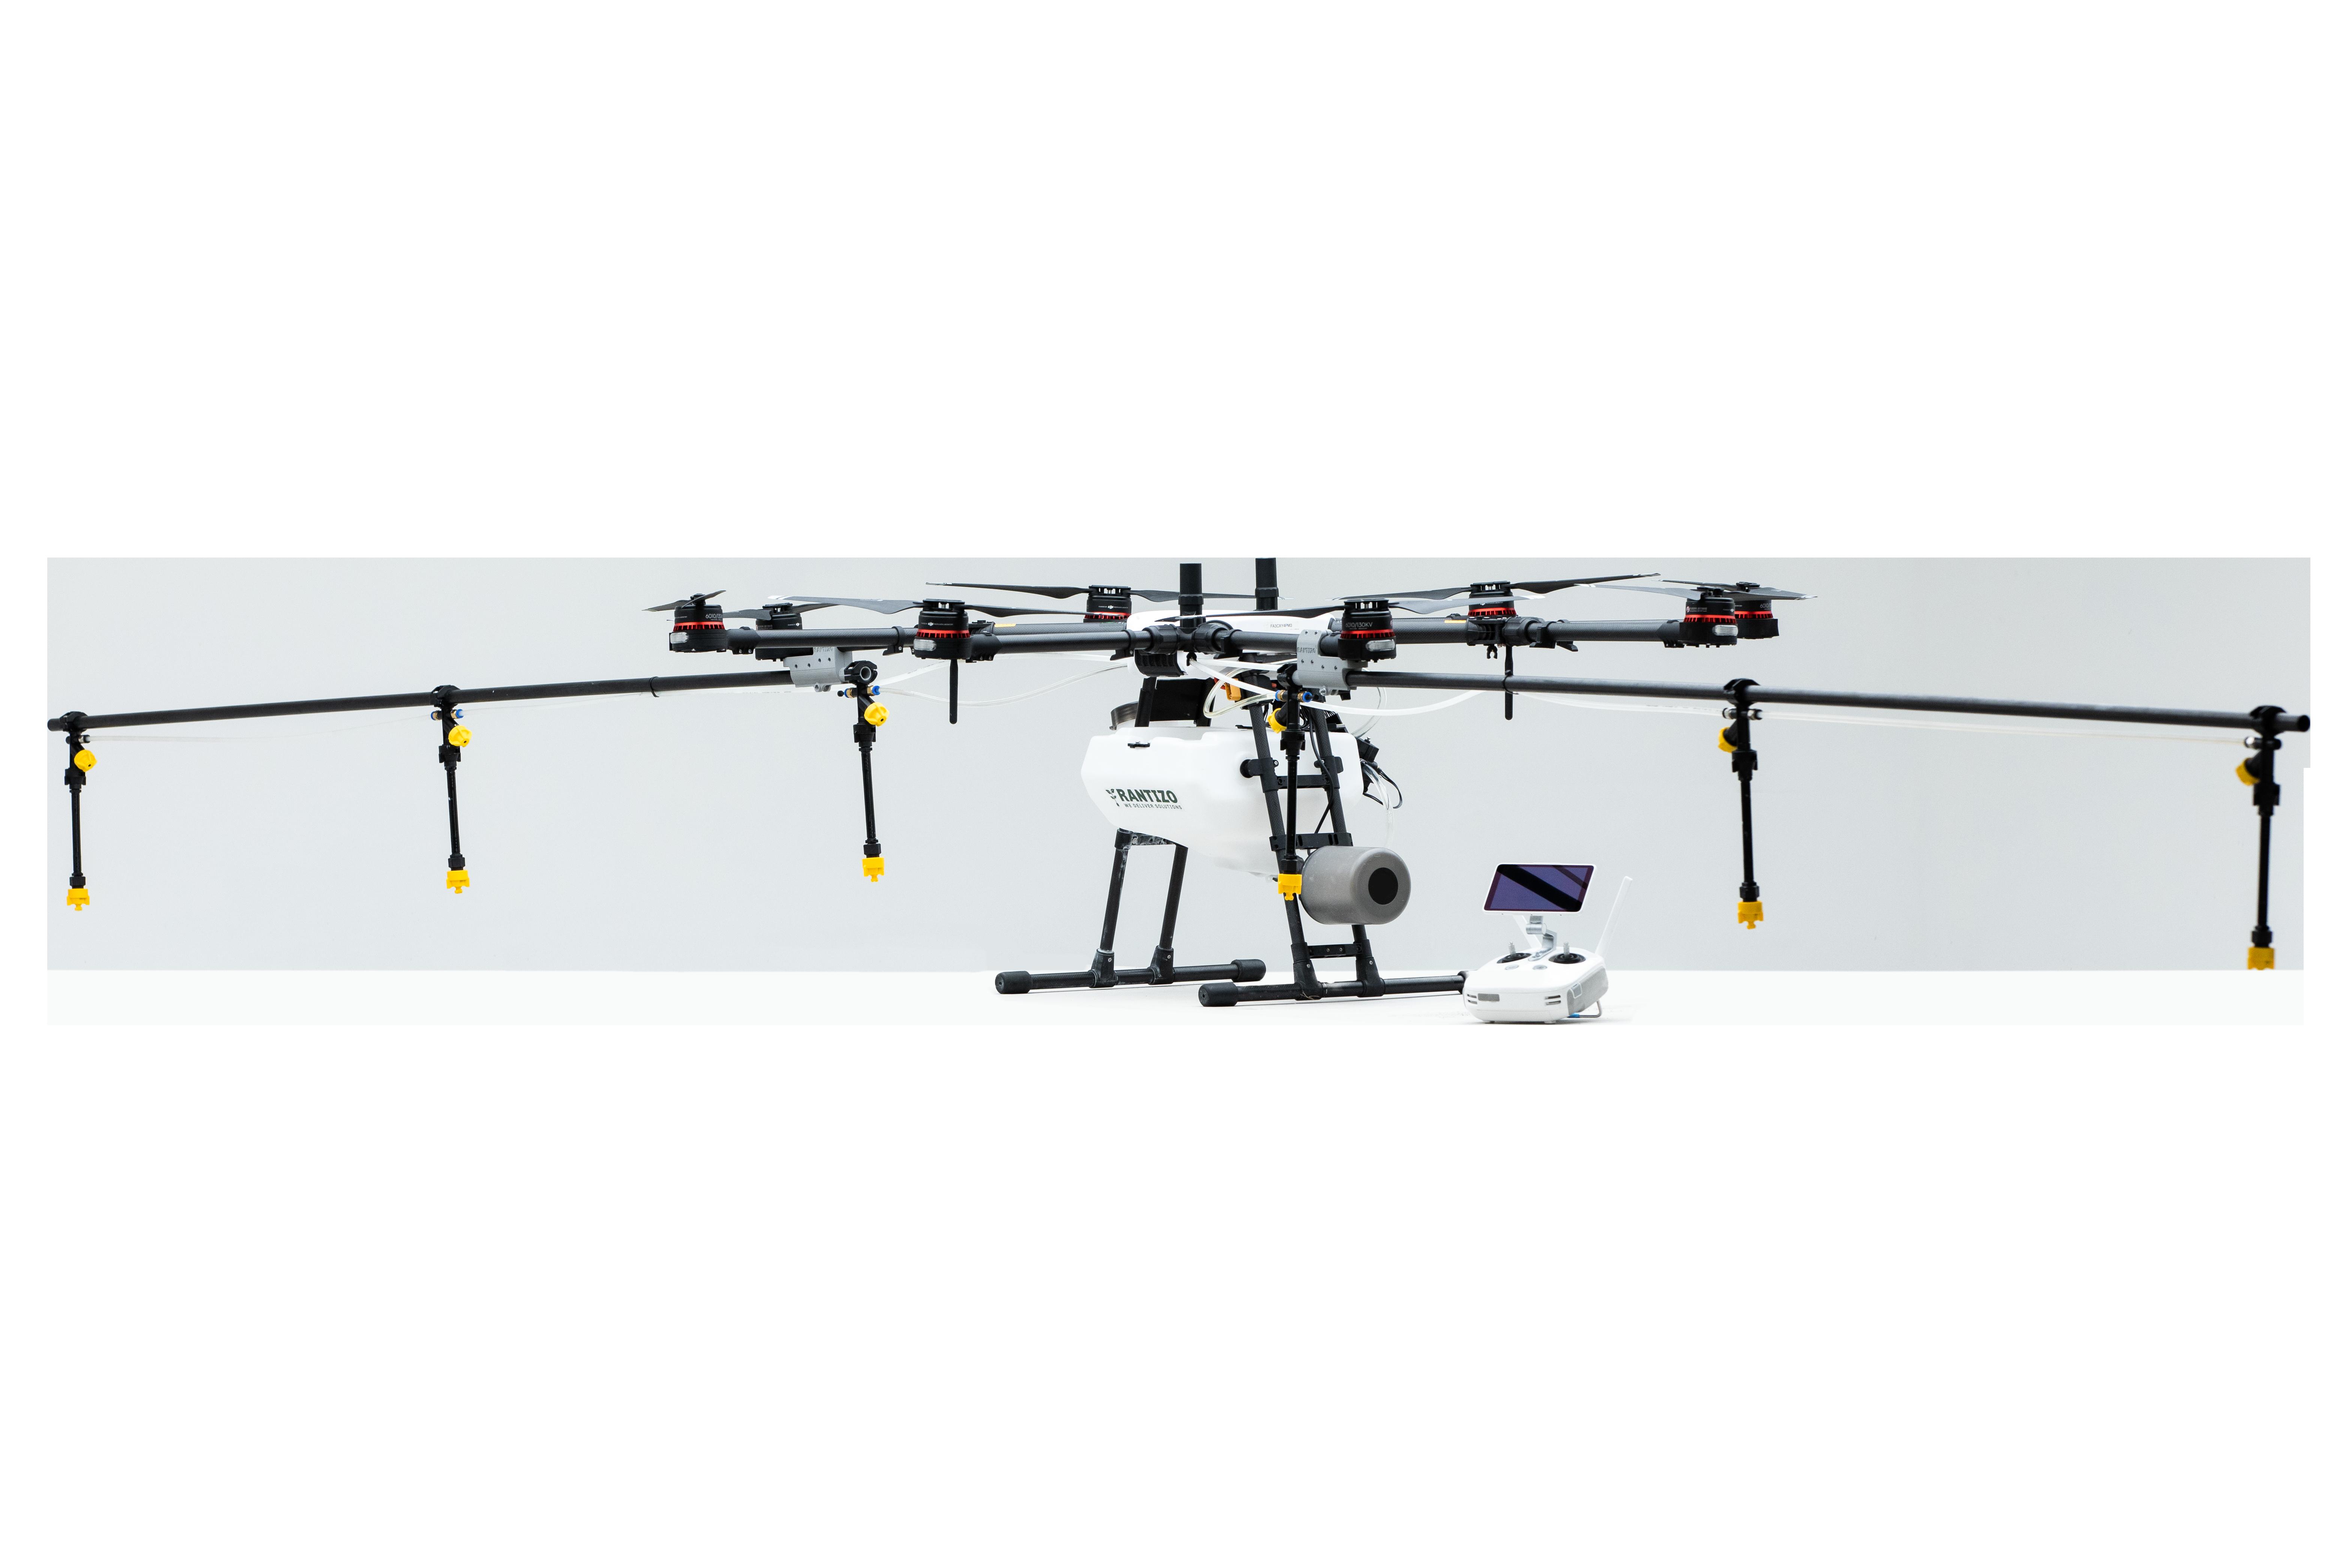 DJI Agras MG-1P agricultural drone sprayer with Rantizo upgrade kit